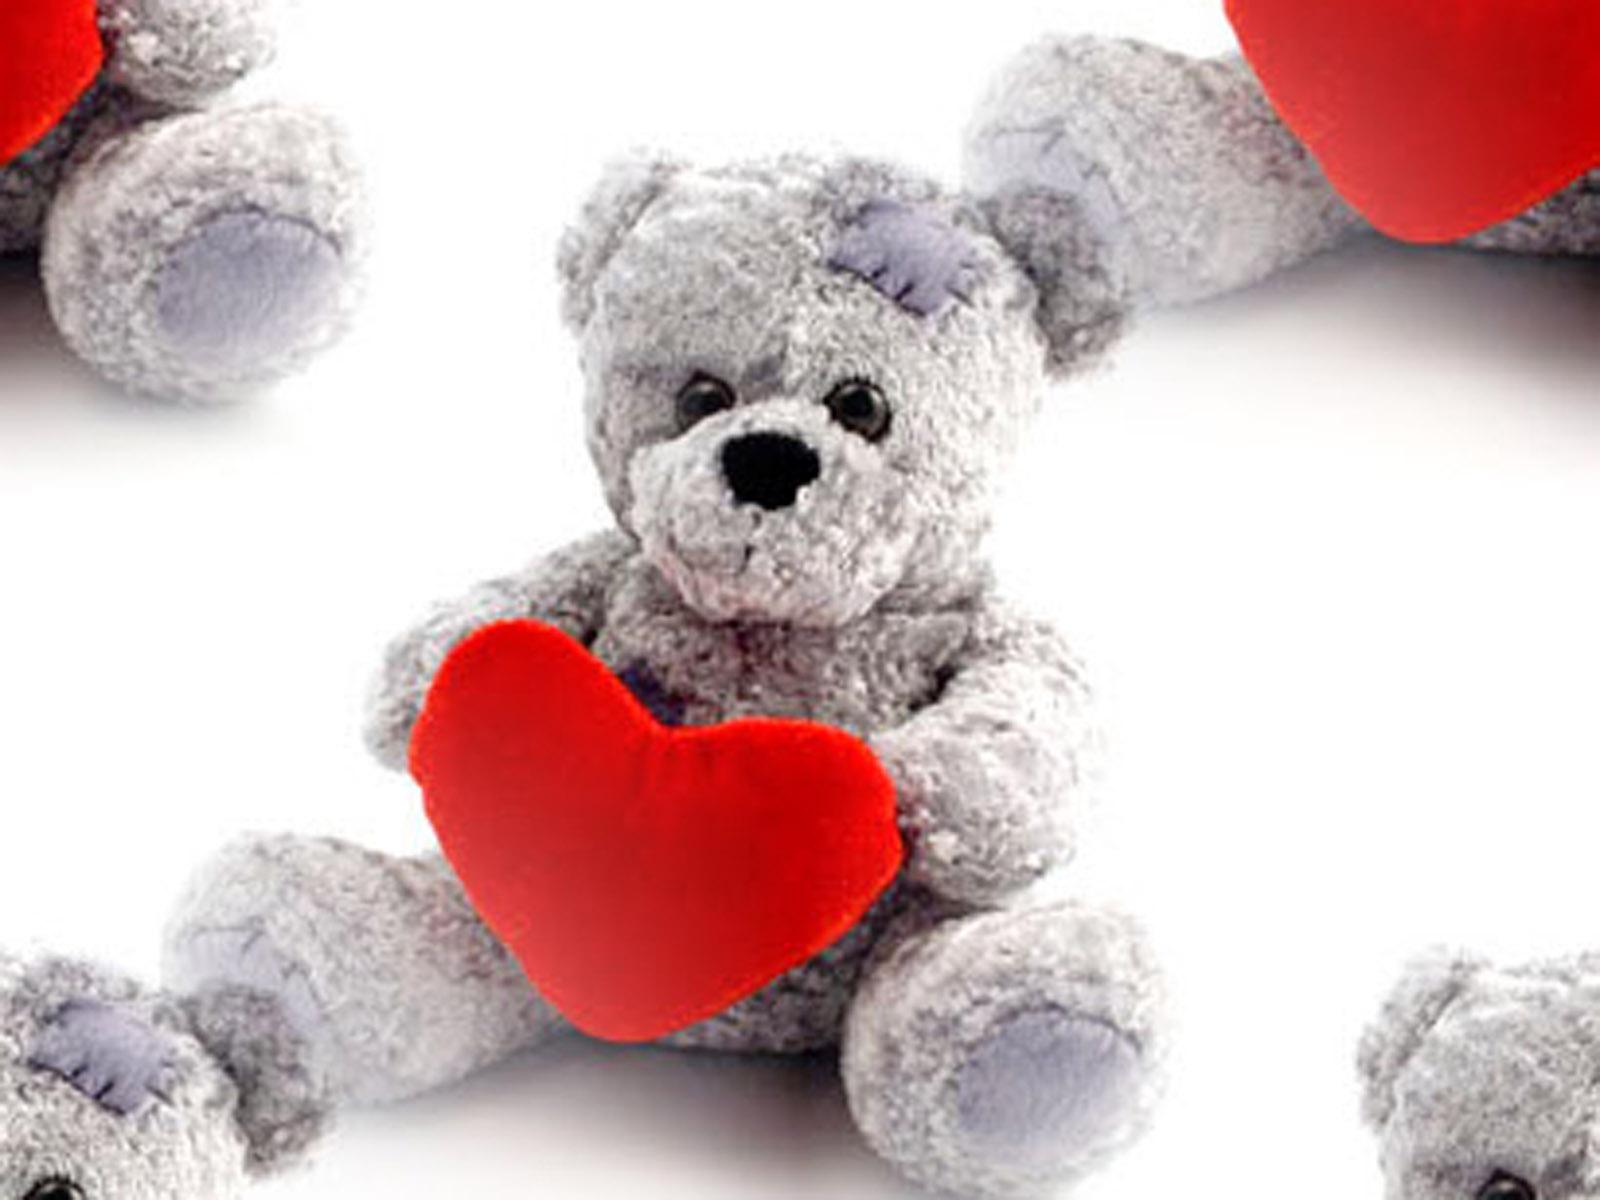 High Hd Wallpaper Download Hd Wallpapers Love Teddy Bear Wallpapers